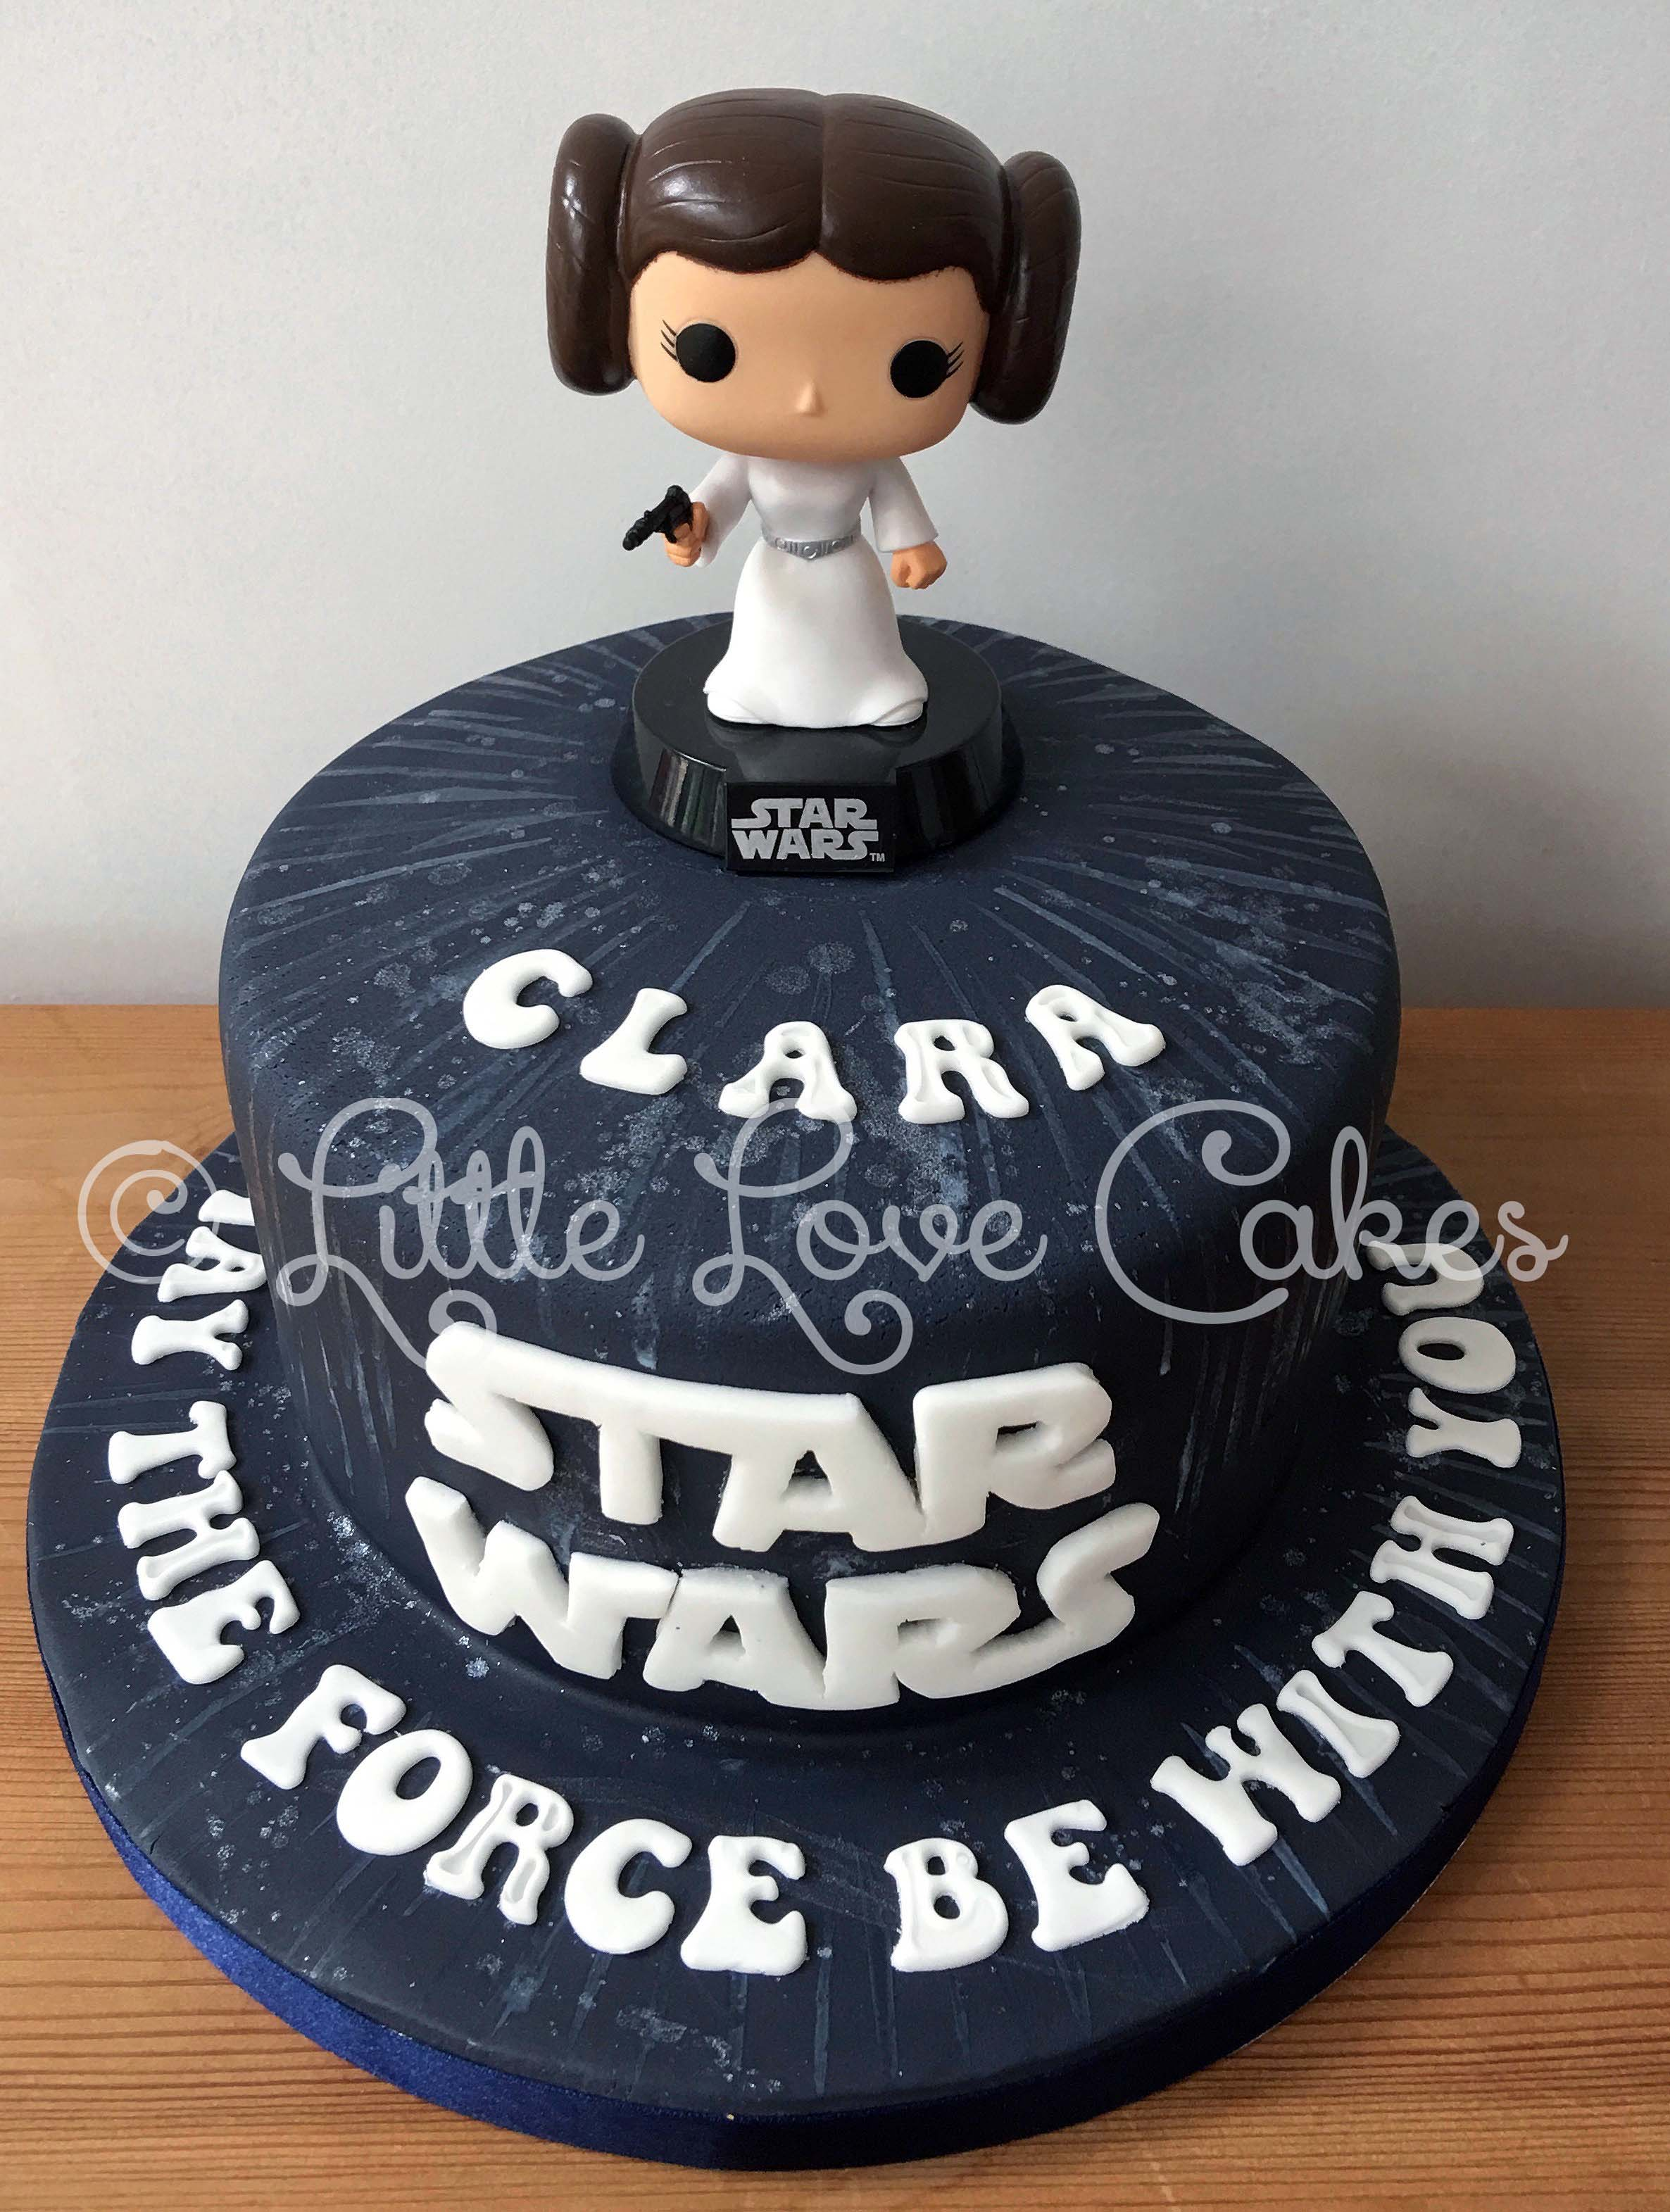 Star Wars Princess Leia cake